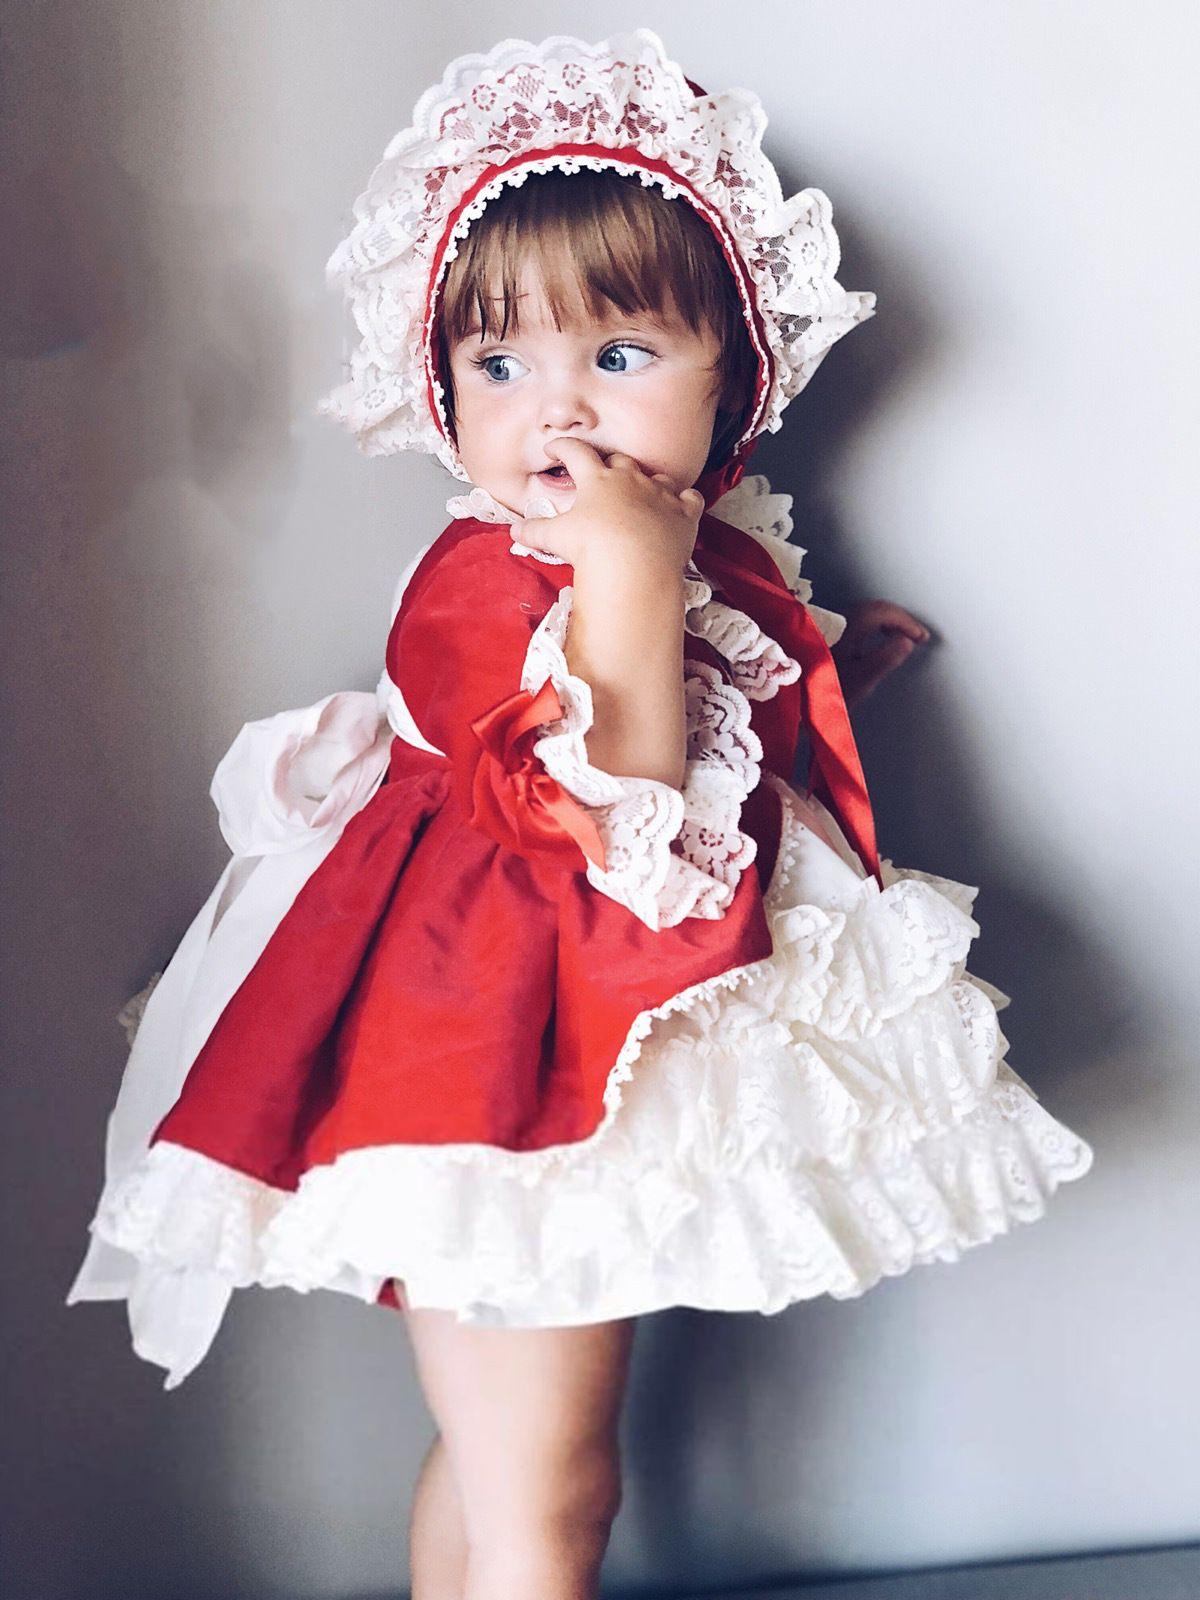 4pcs Spanish Baby Girls Baptism Lolita Princess Dresses Toddler Girl Party Dress Christmas thanksgiving vintage Christmas tutu #babygirlpartydresses